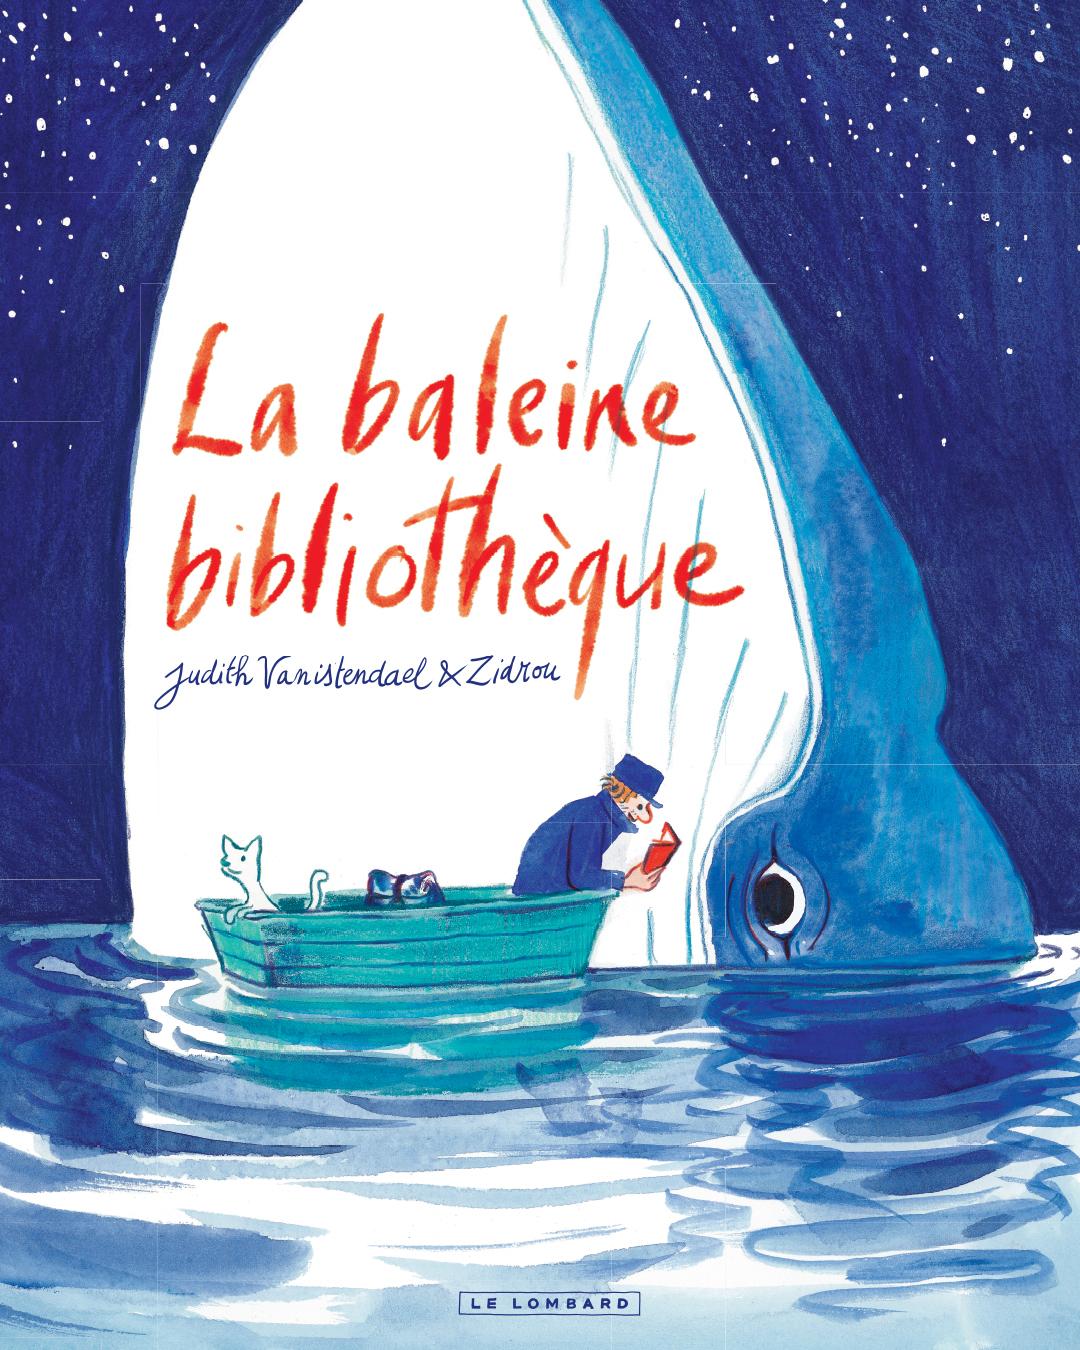 Dédicace :Judith Vanistendael & Zidrou (La Baleine Bibliothèque)